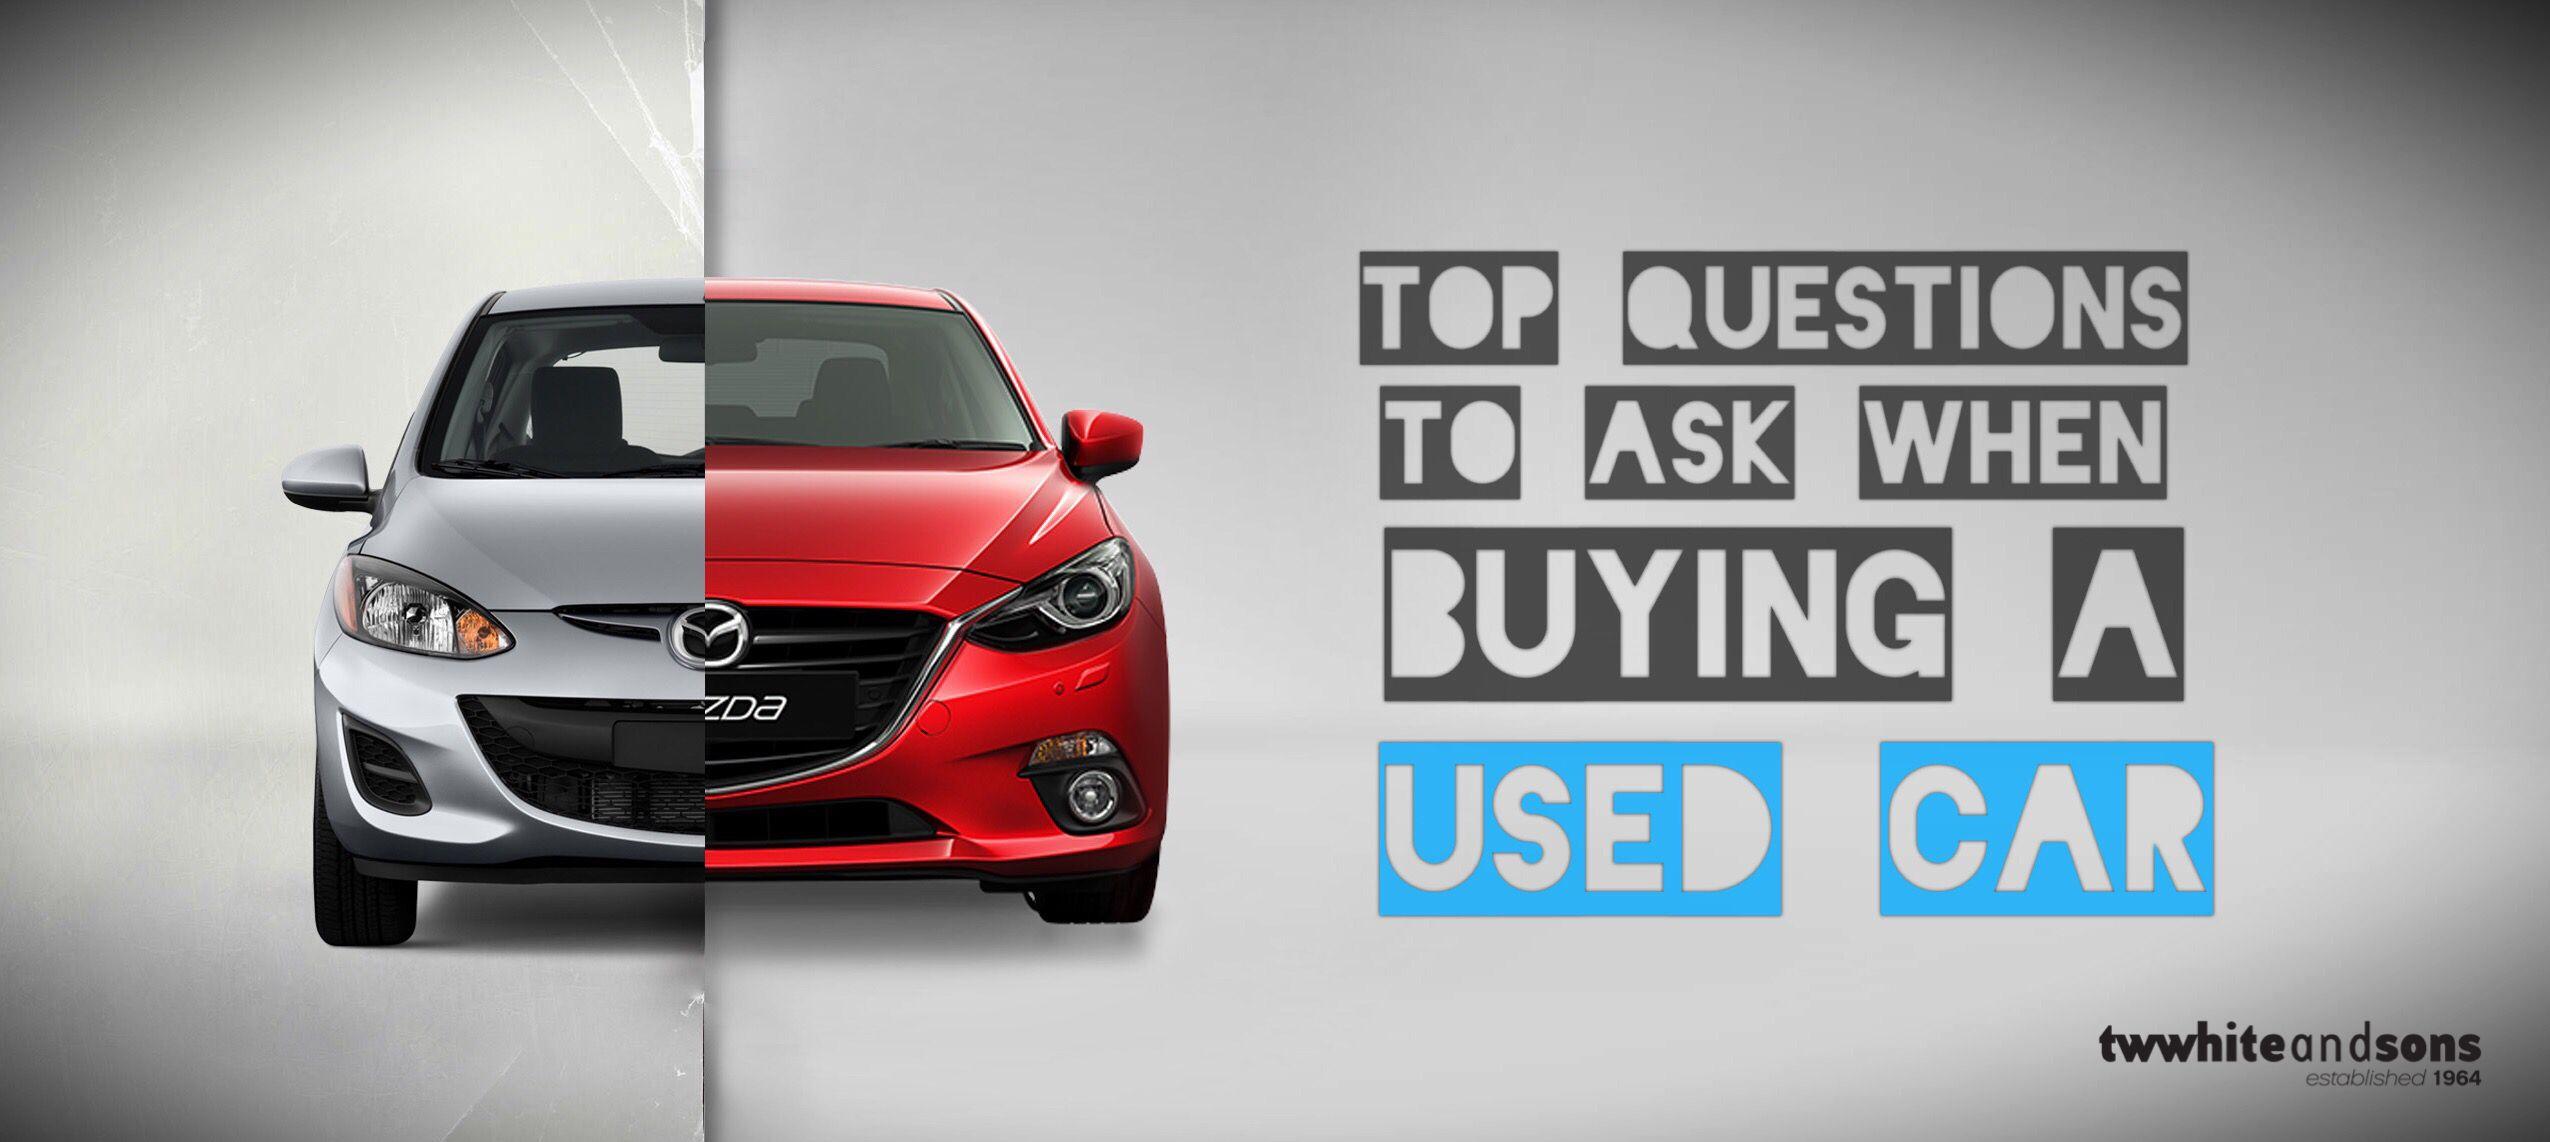 Best Used Car Deals Car Deals Car Used Cars